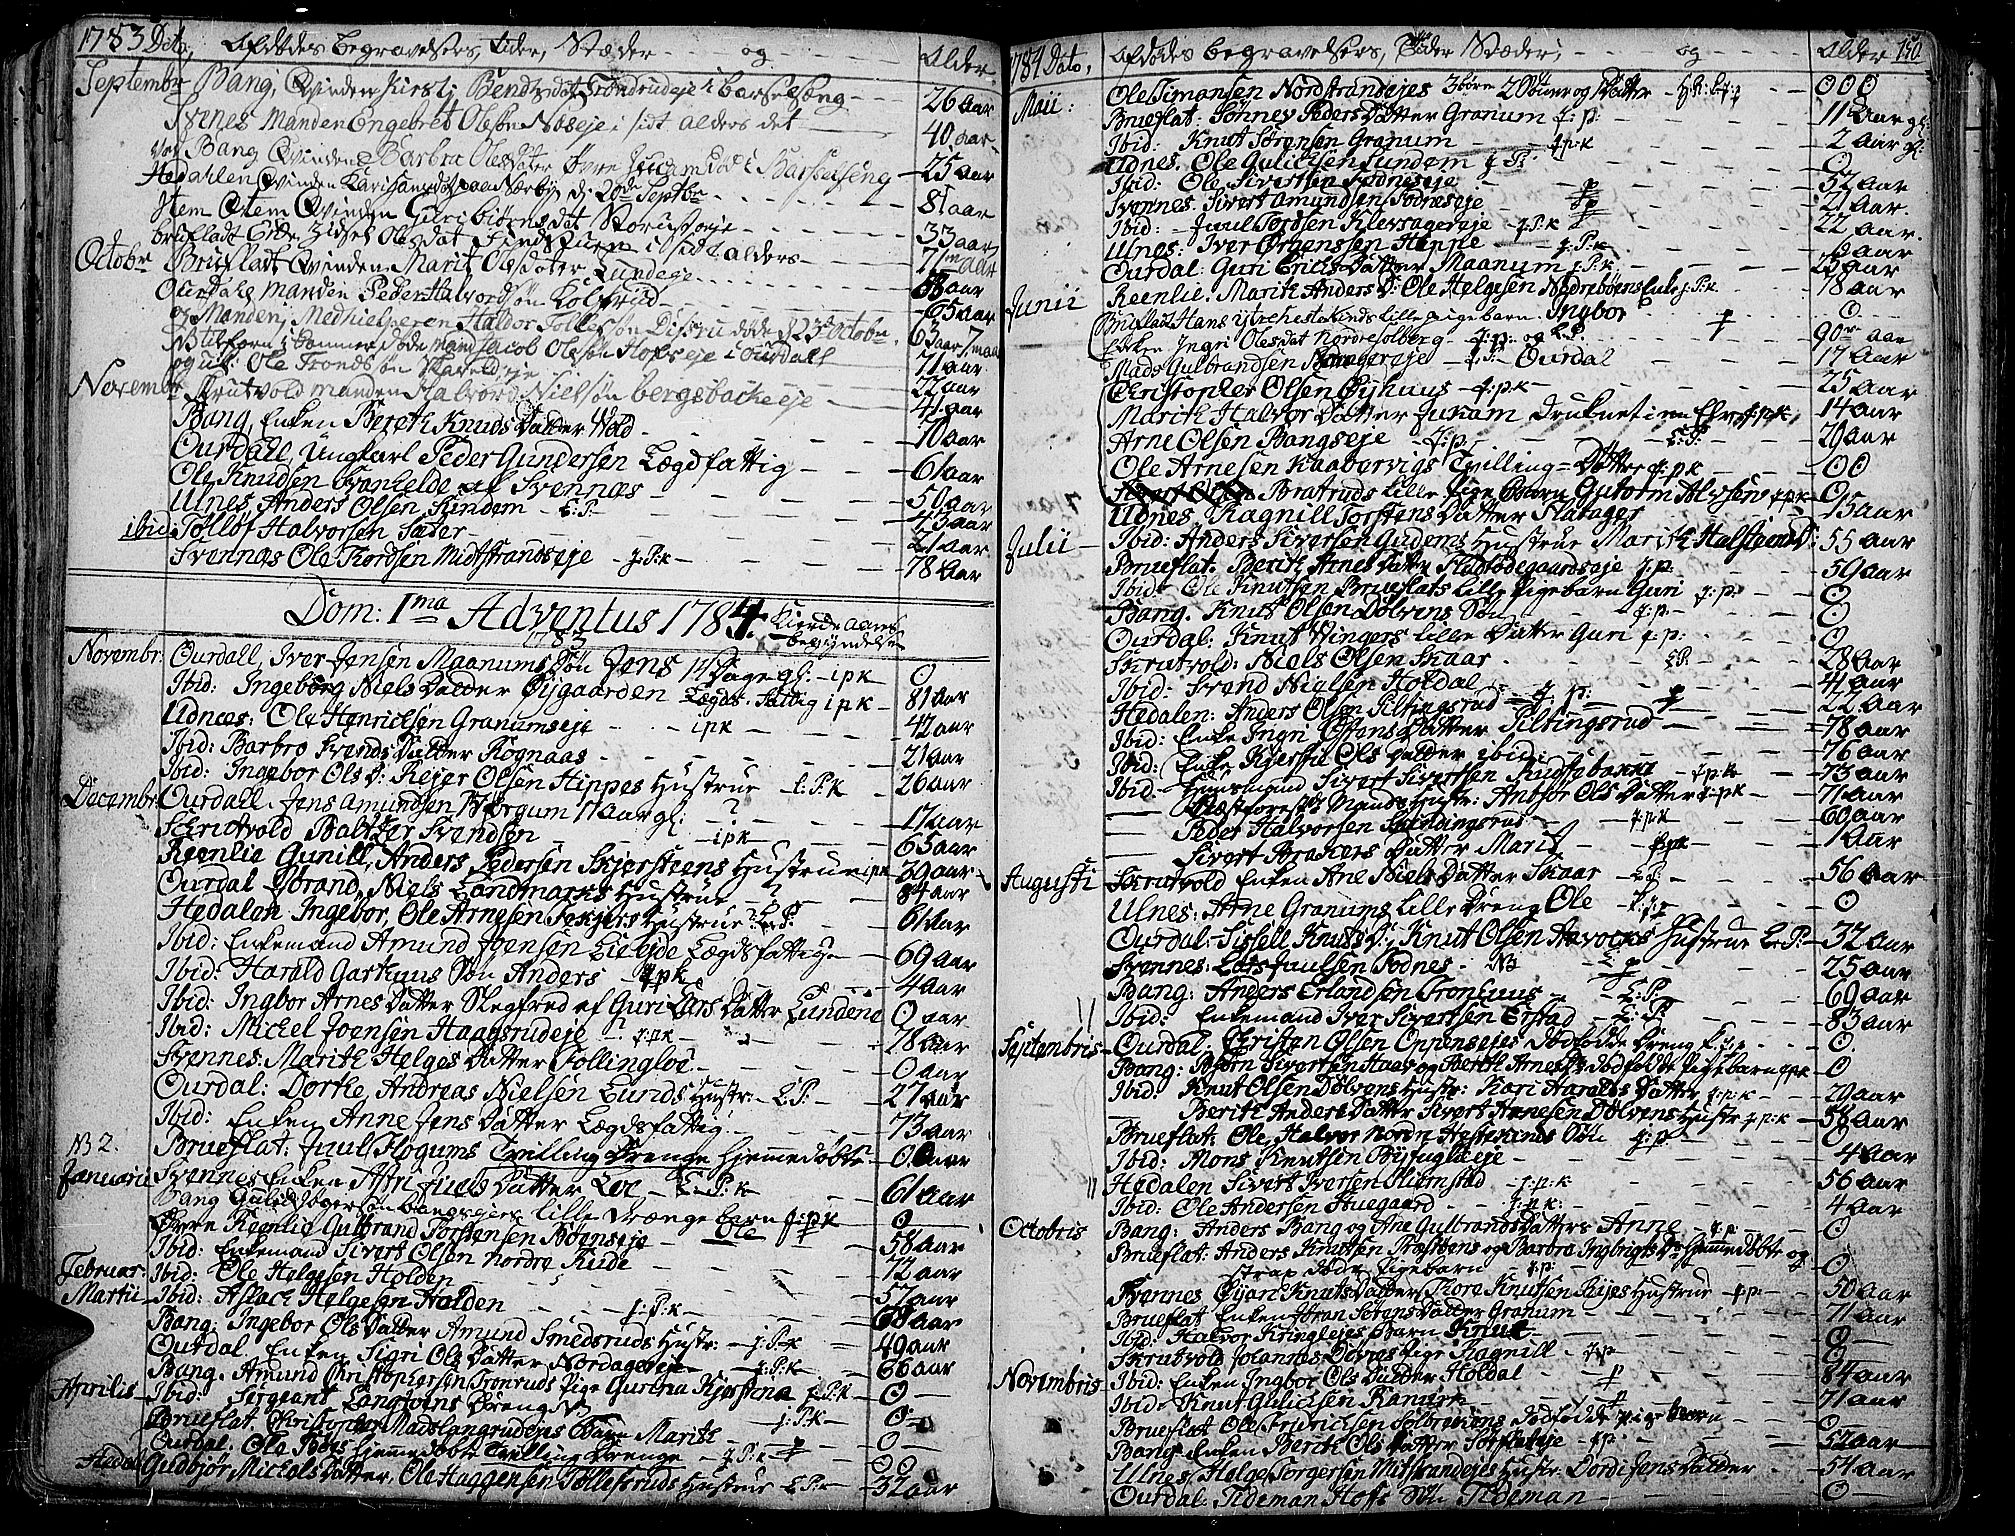 SAH, Aurdal prestekontor, Ministerialbok nr. 6, 1781-1804, s. 150